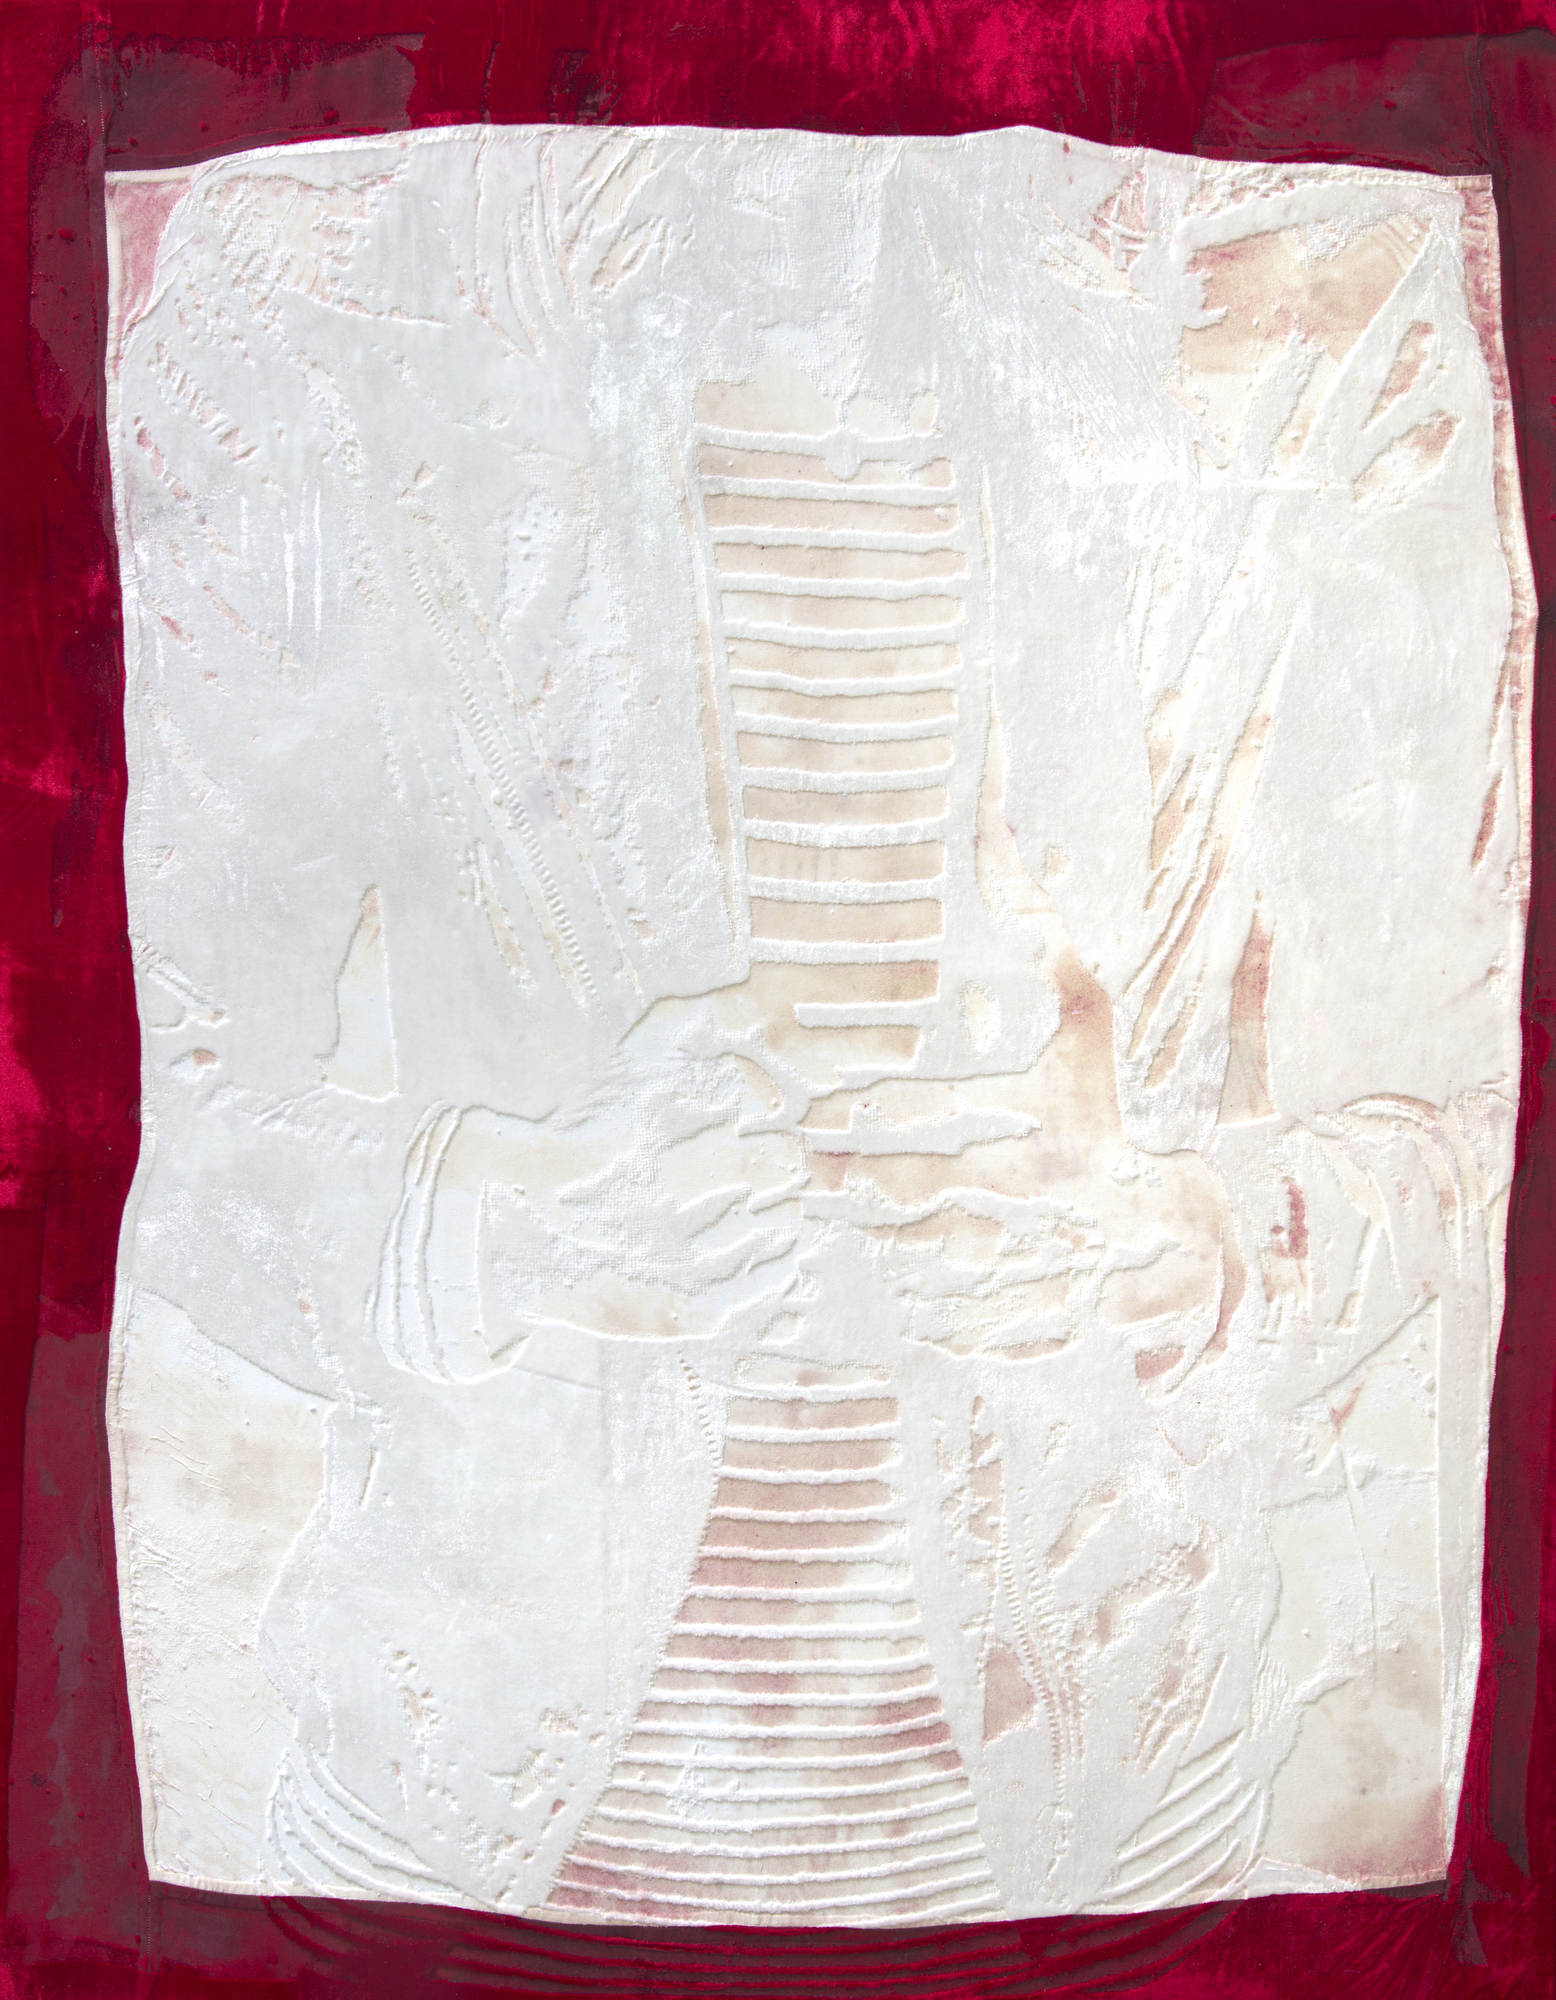 Matthew Brandt, RBT01, 2015